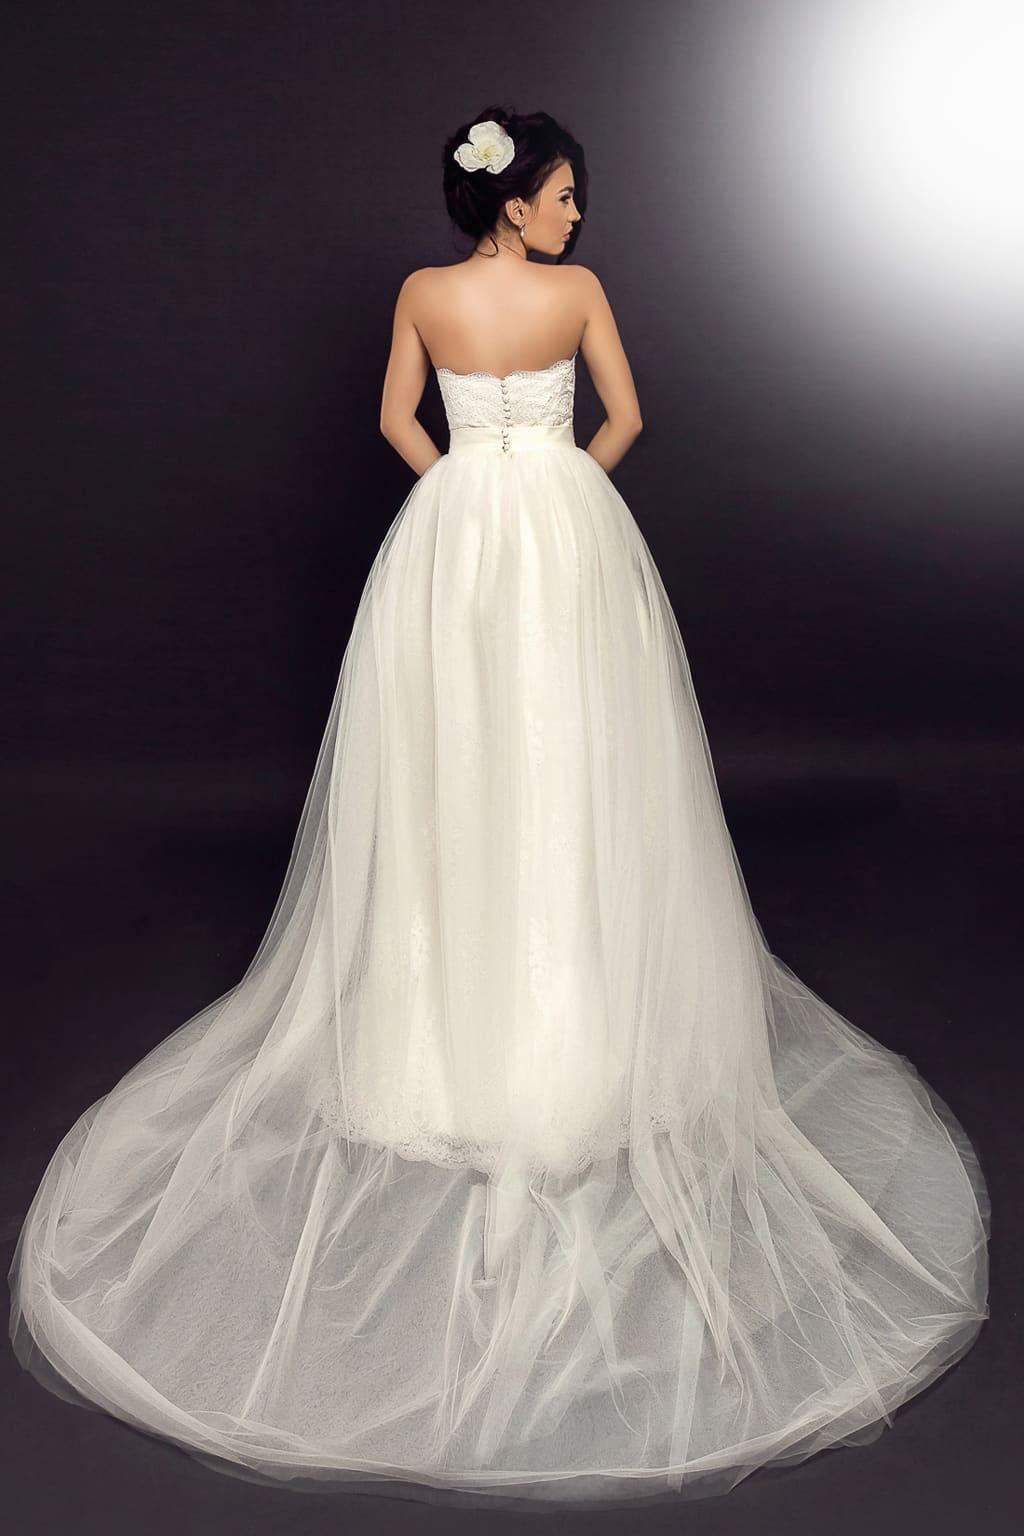 Padova Model - Colectia Dreams - Adora Sposa (3)